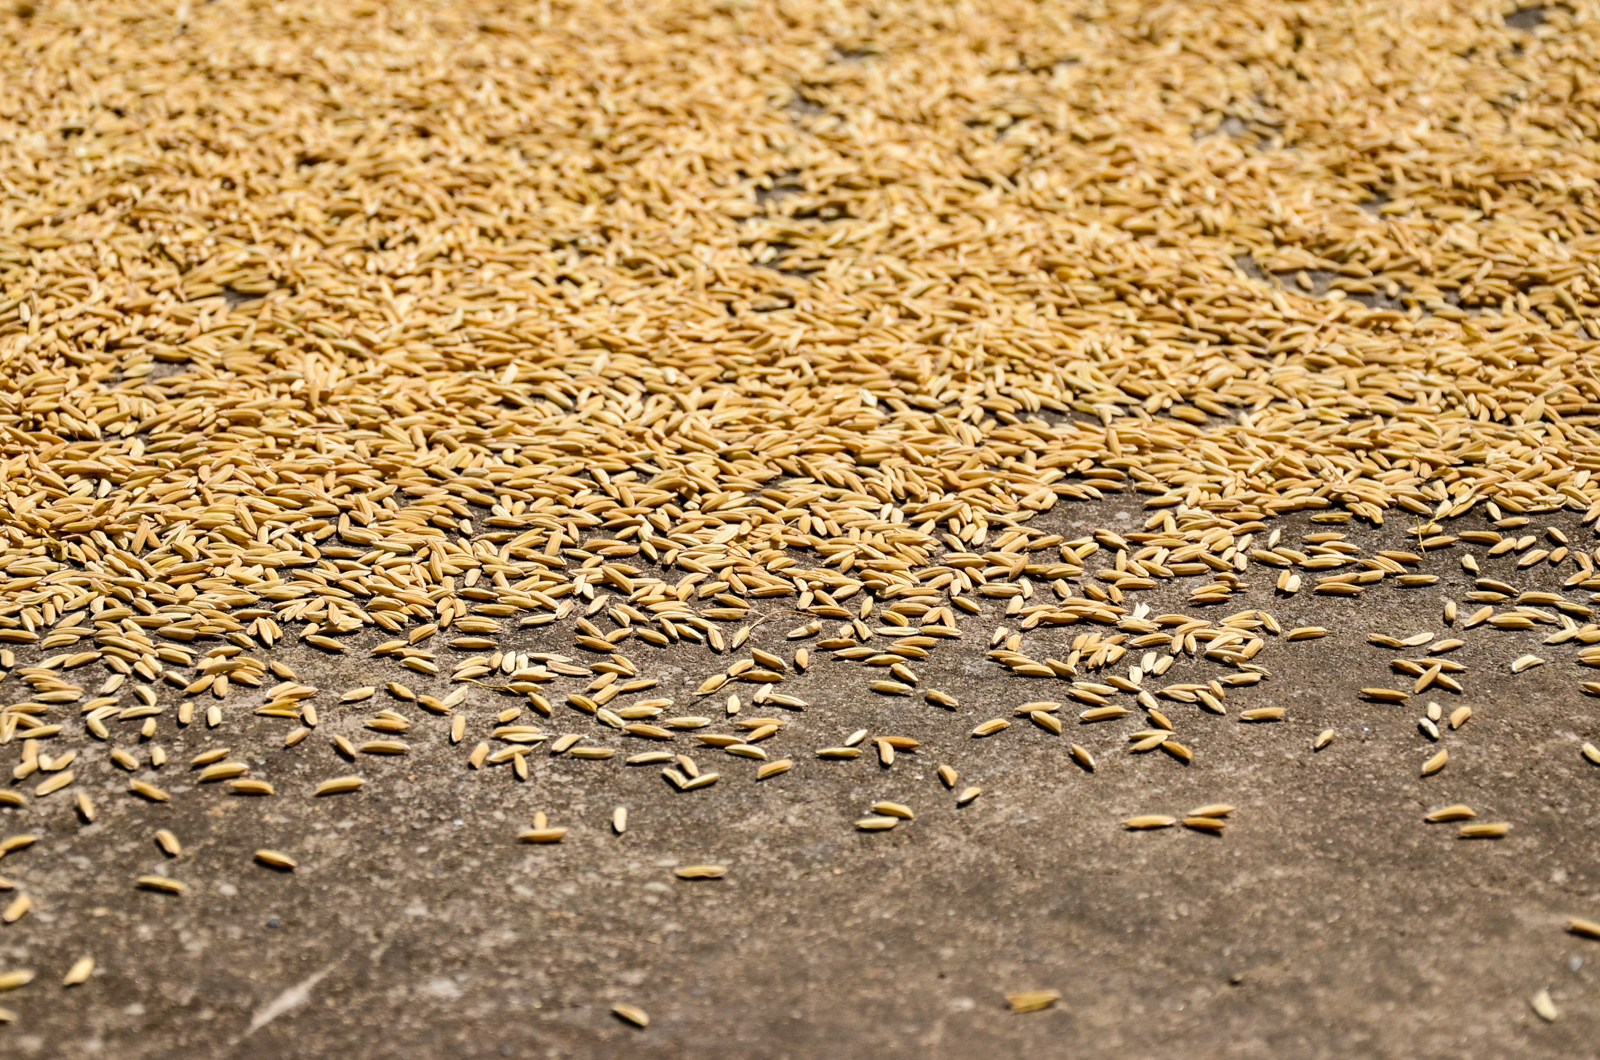 Séchage de riz